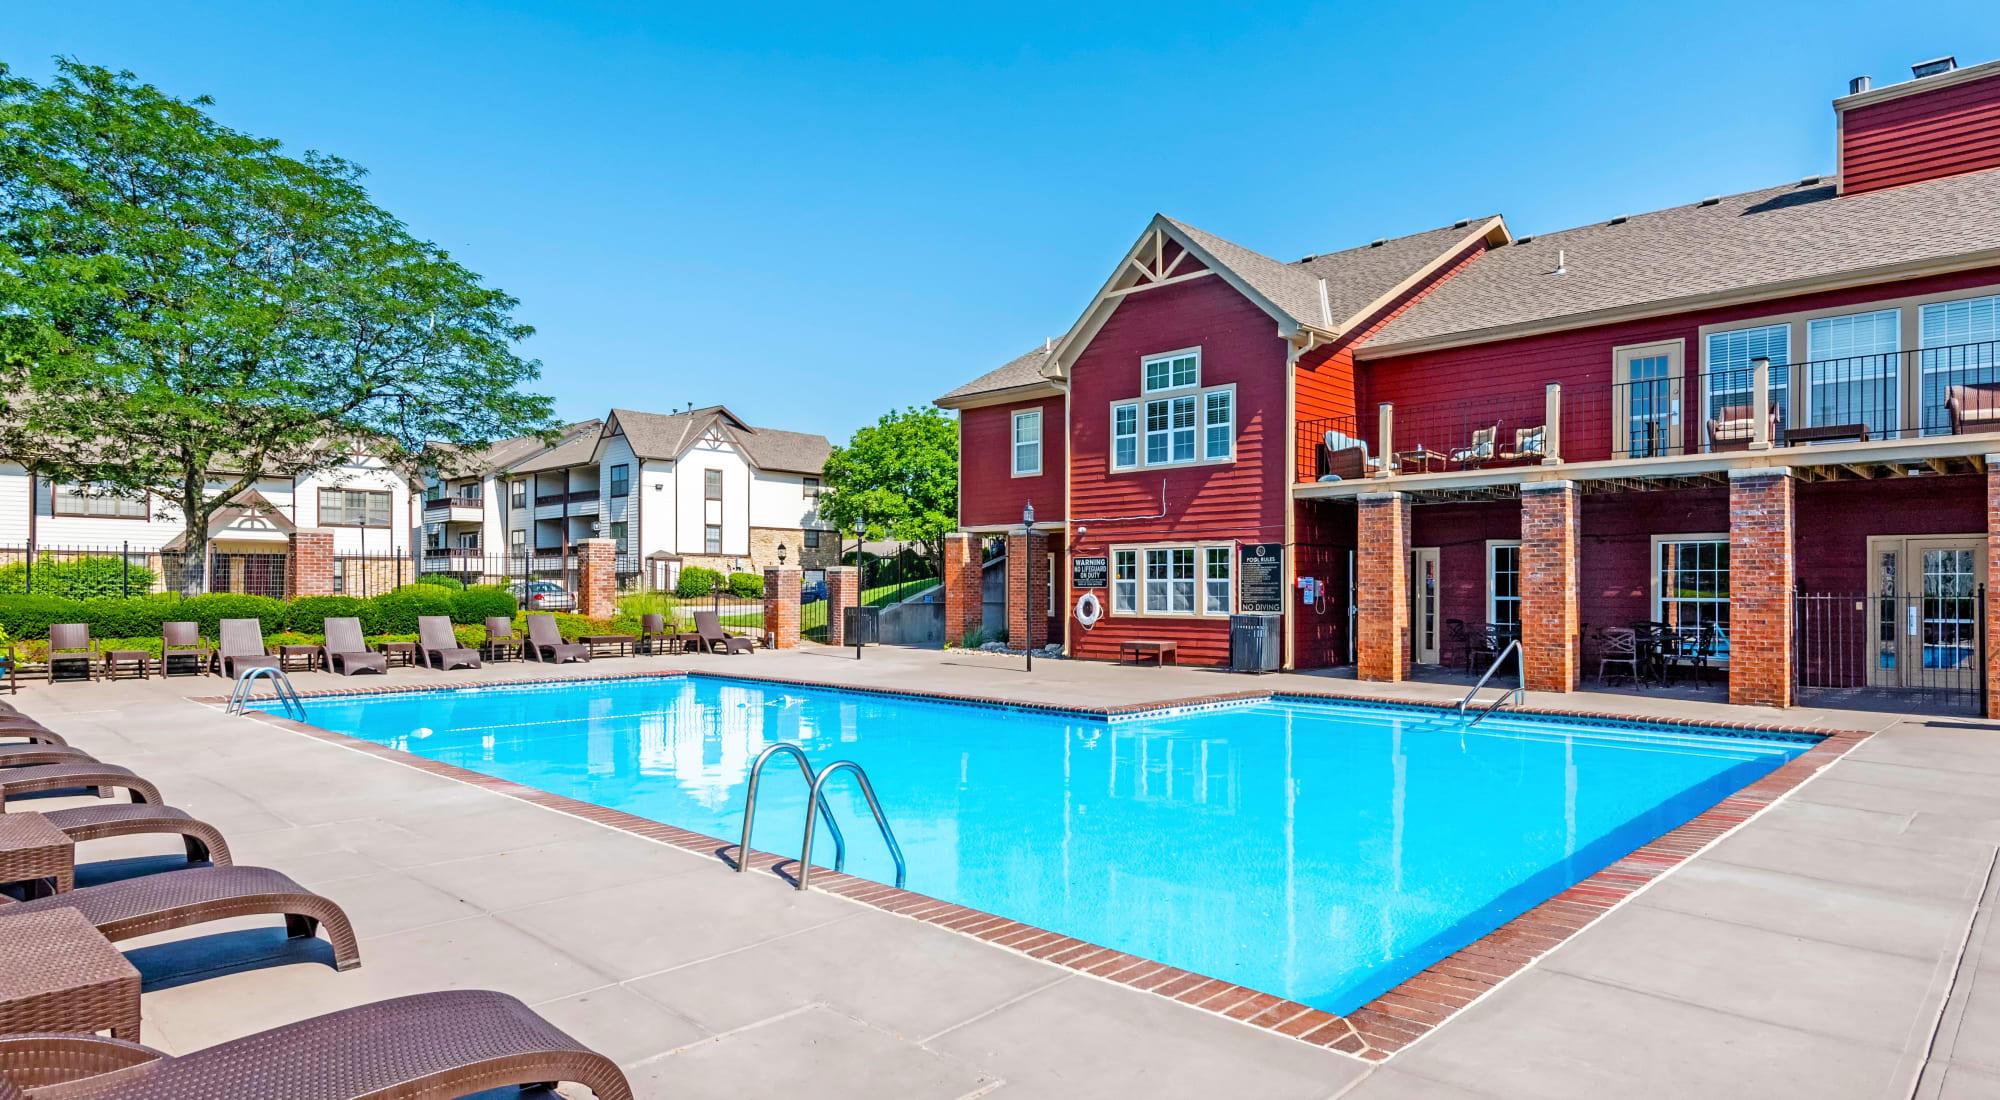 Coach House Apartments in Kansas City, Missouri